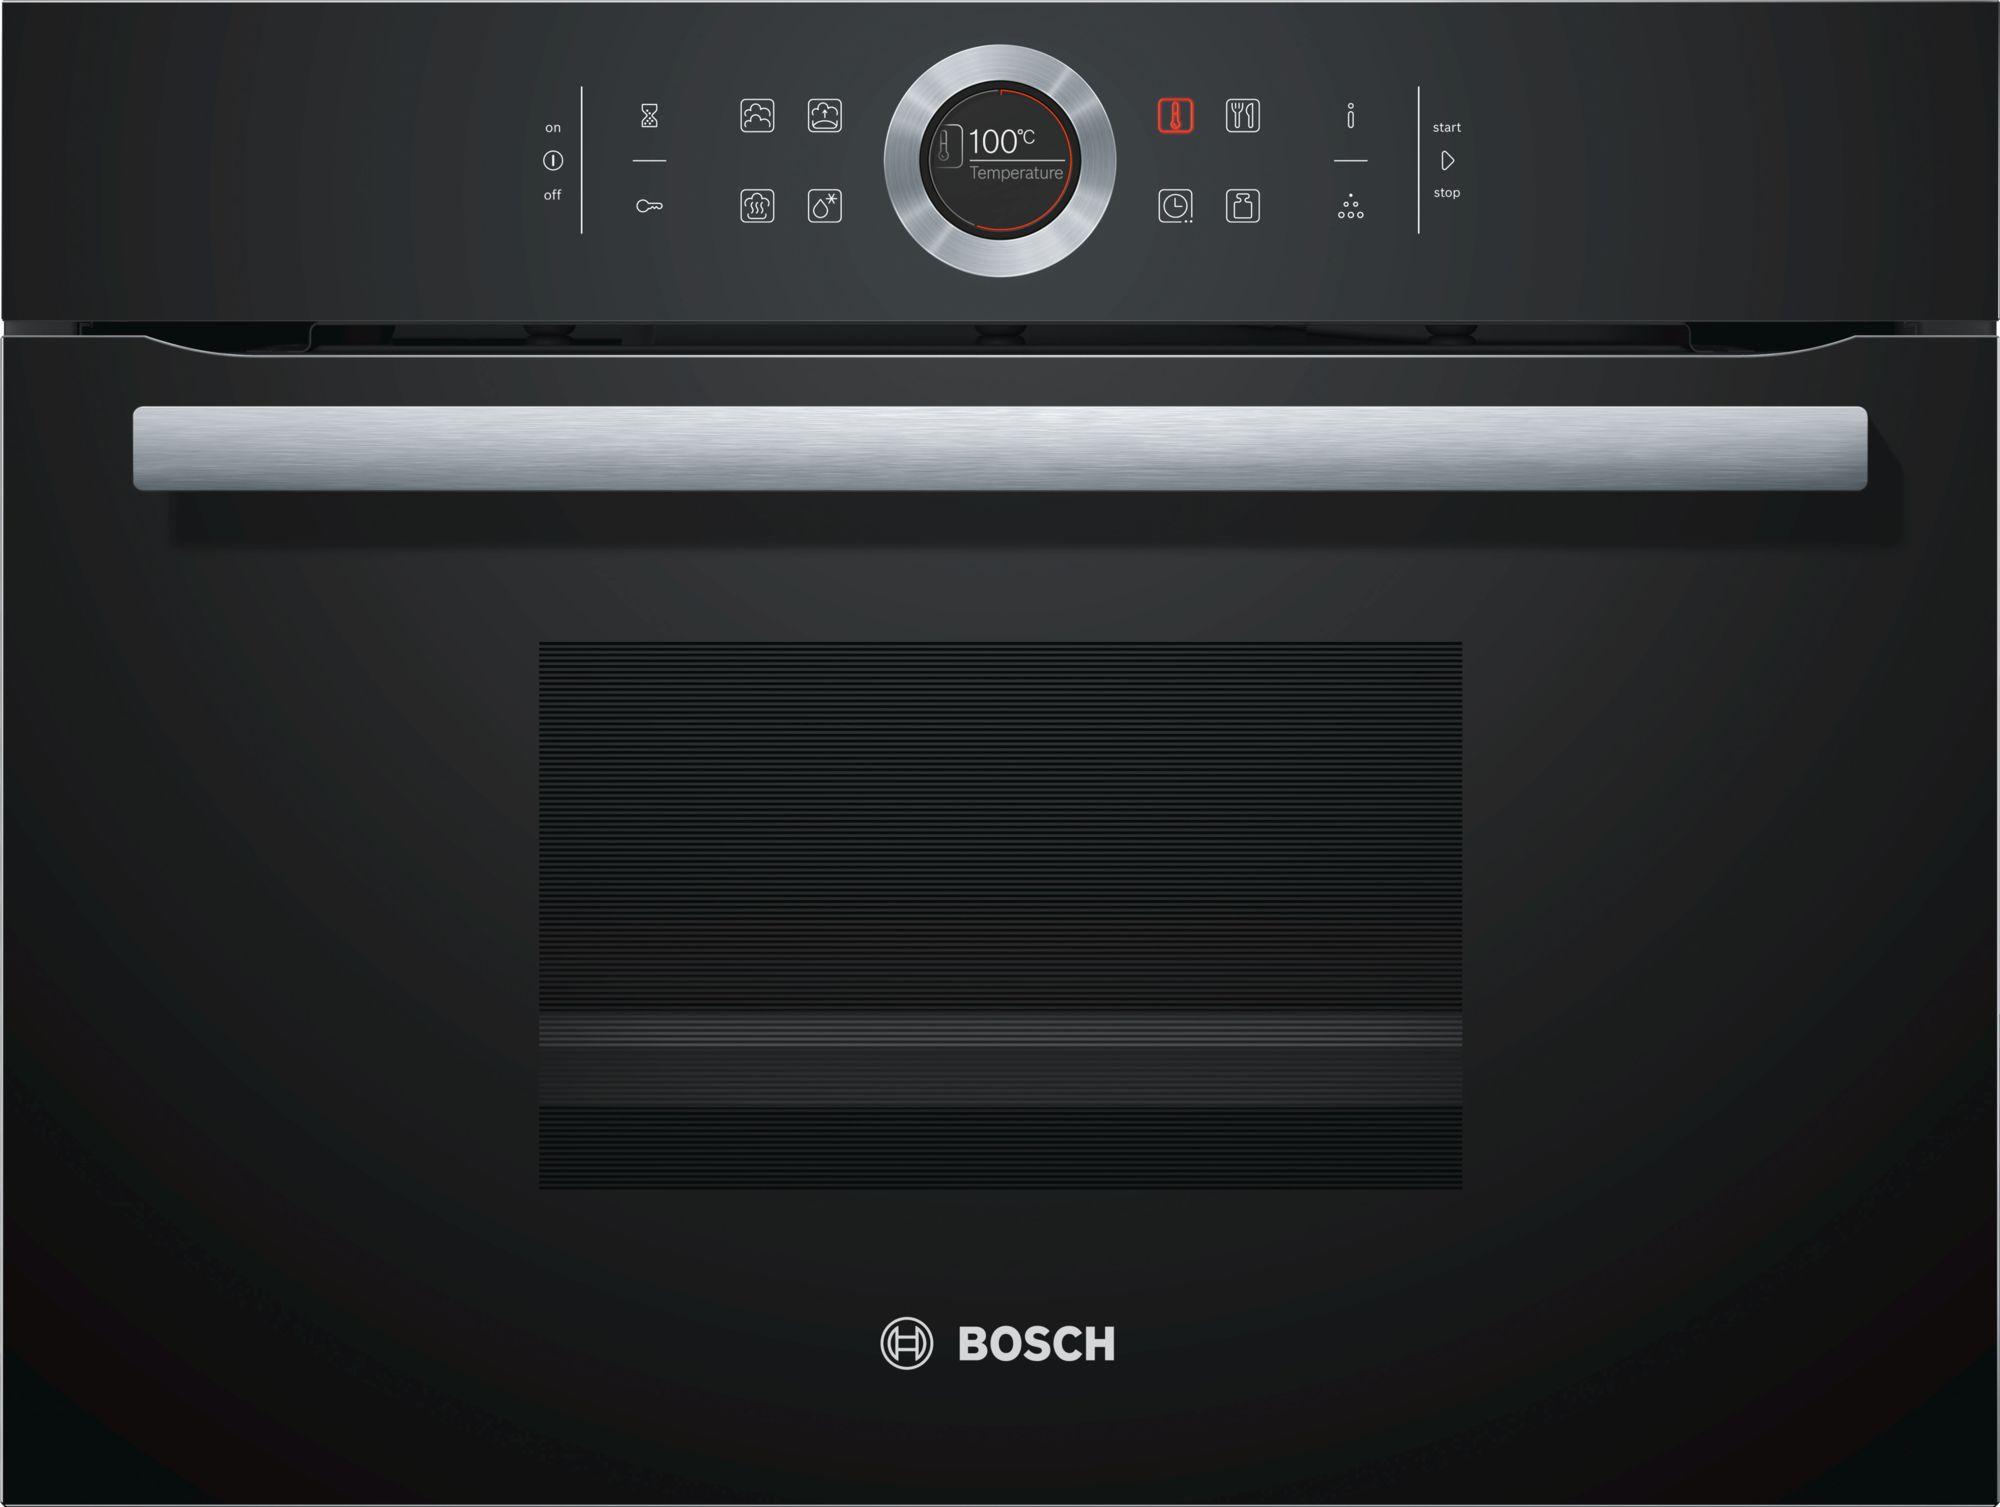 Bosch Kühlschrank Hotline : Bosch cdg bb kompaktdampfgarer dampfgarer backofen